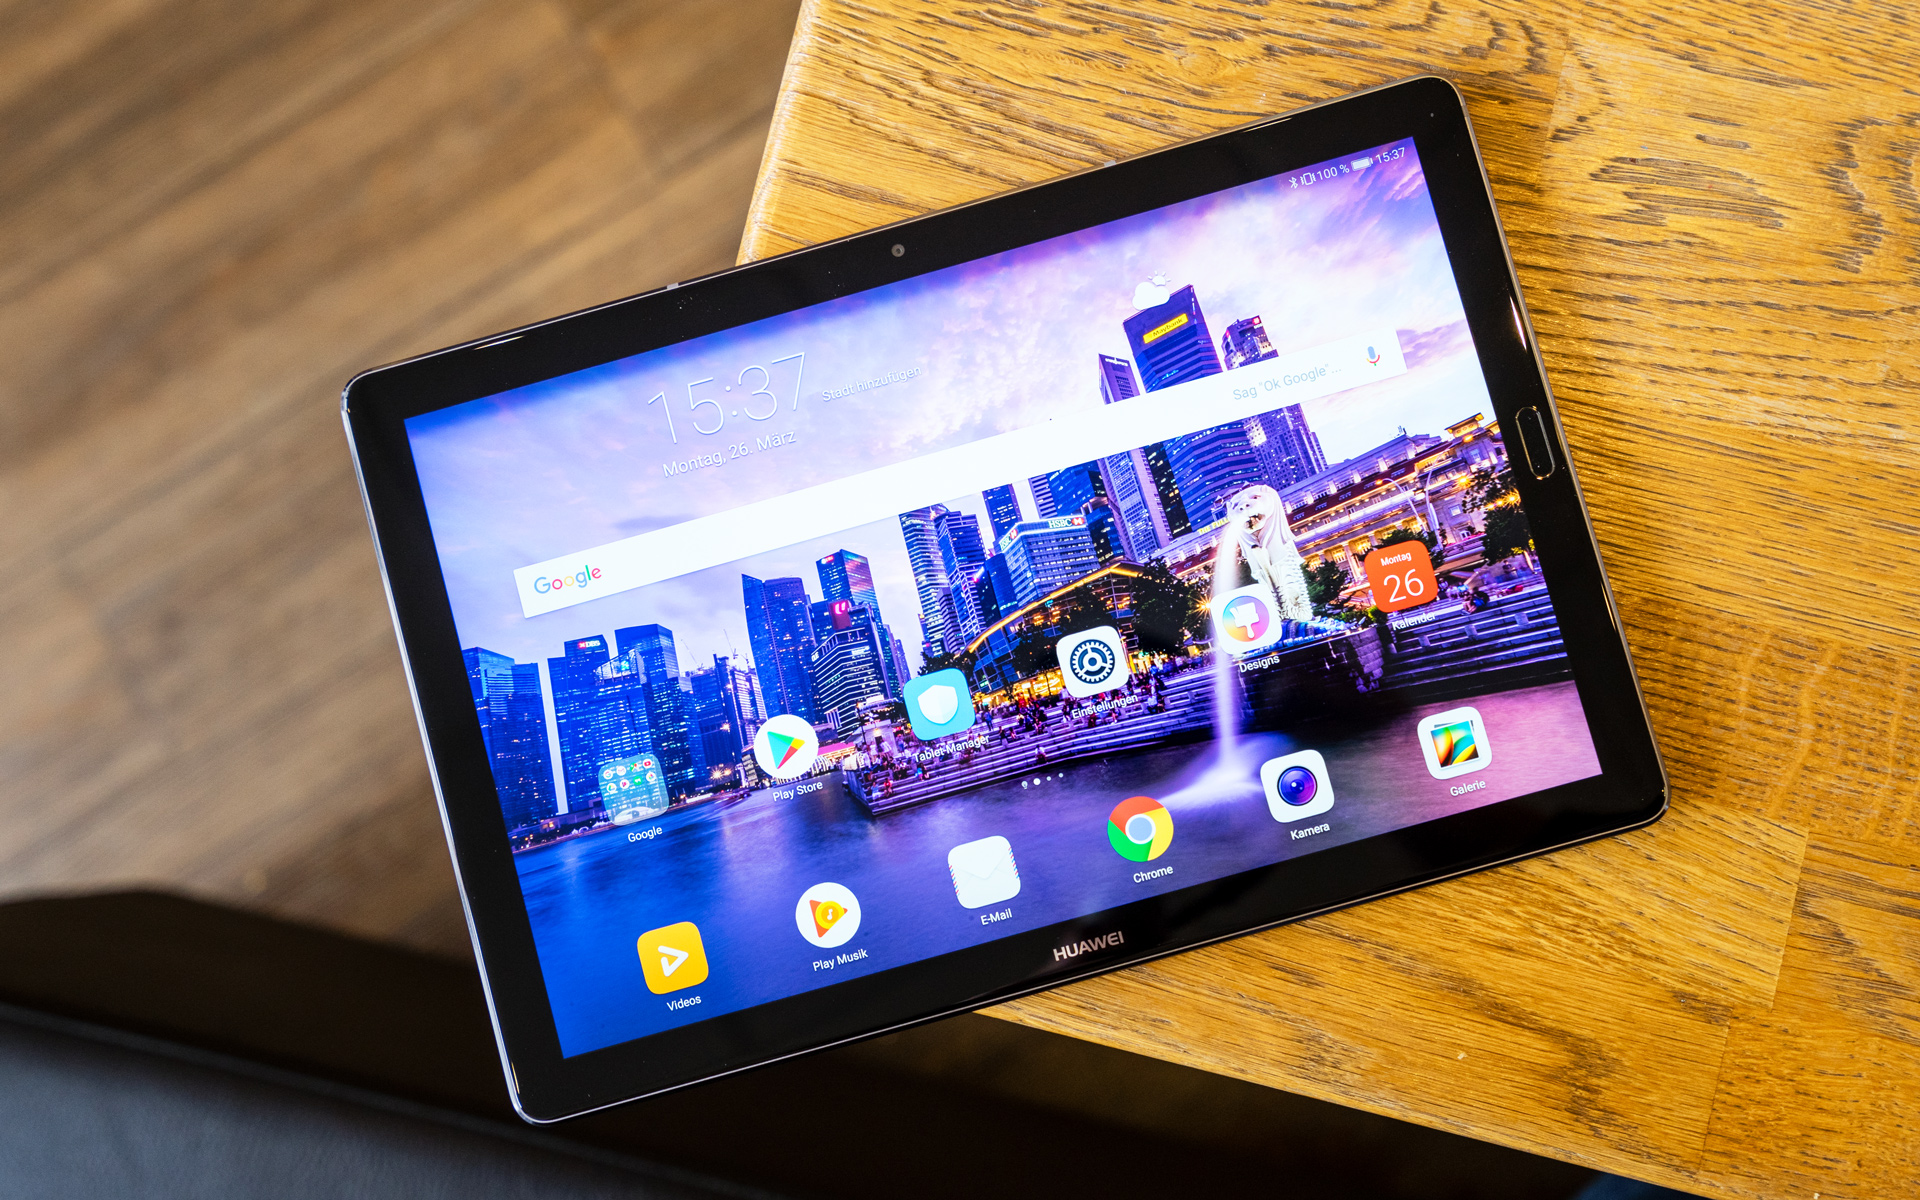 huawei mediapad m5 10 test ein perfektes android tablet. Black Bedroom Furniture Sets. Home Design Ideas